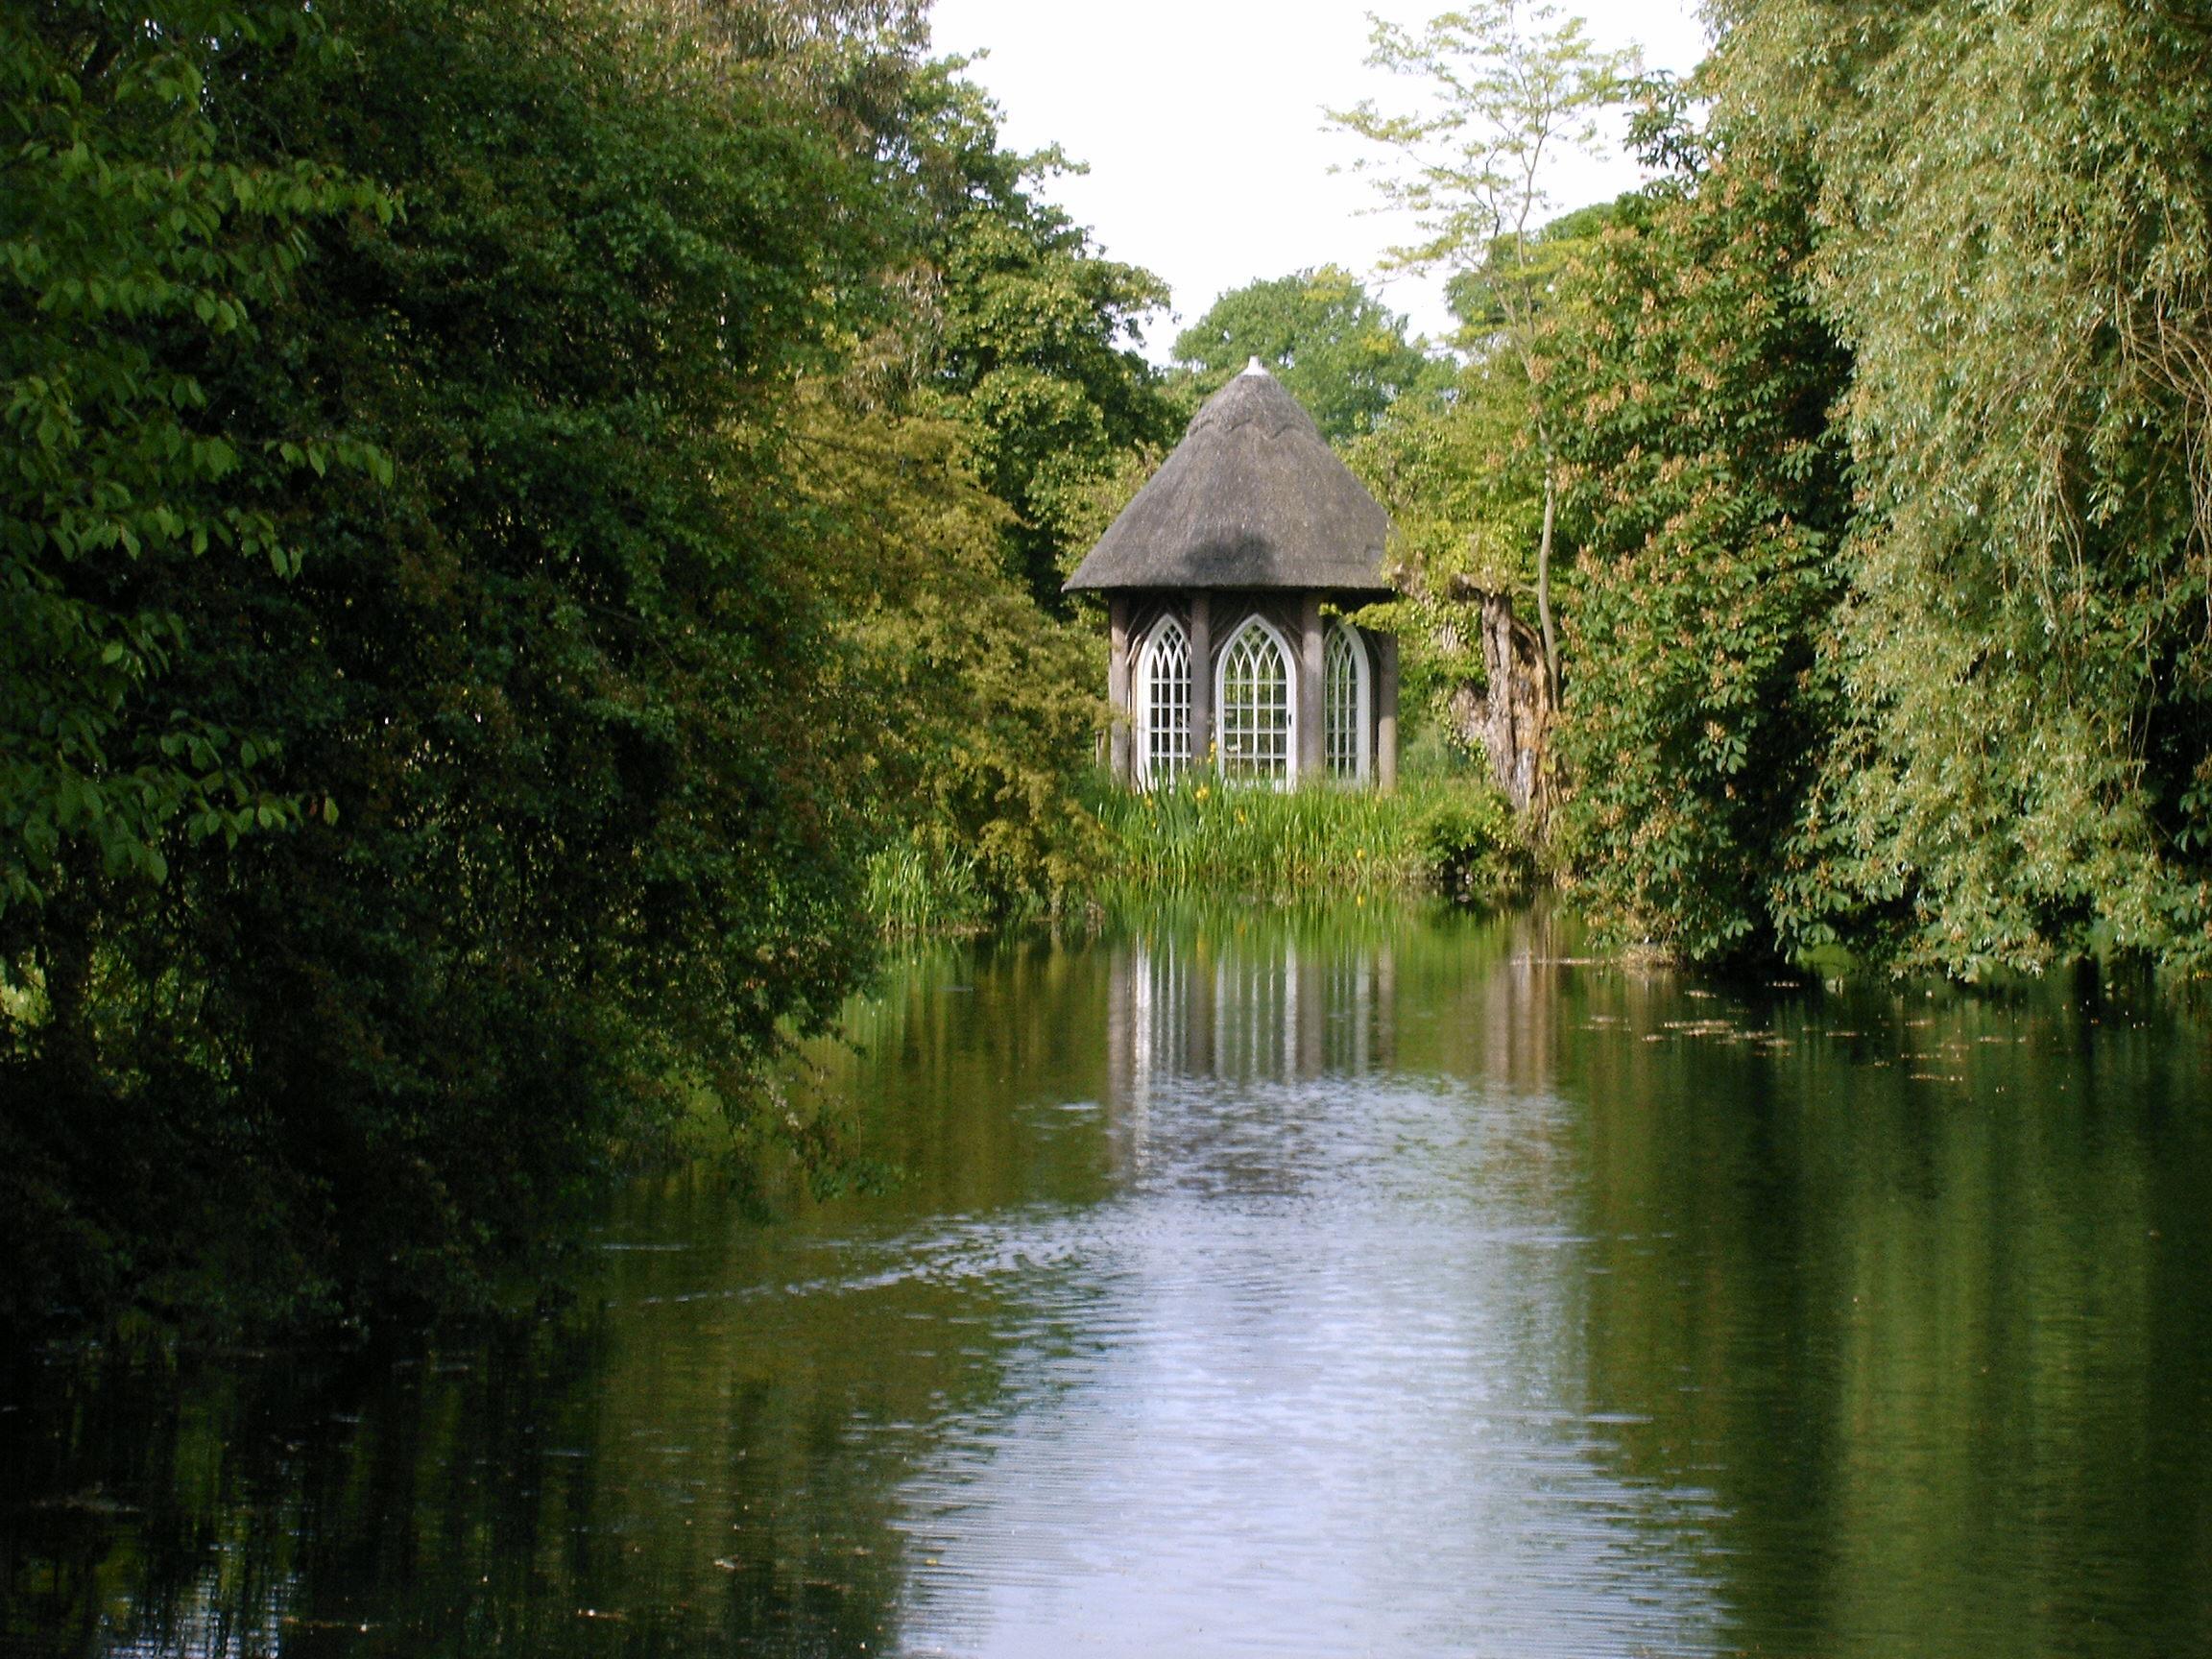 Abbots Ripton Summer House.jpg